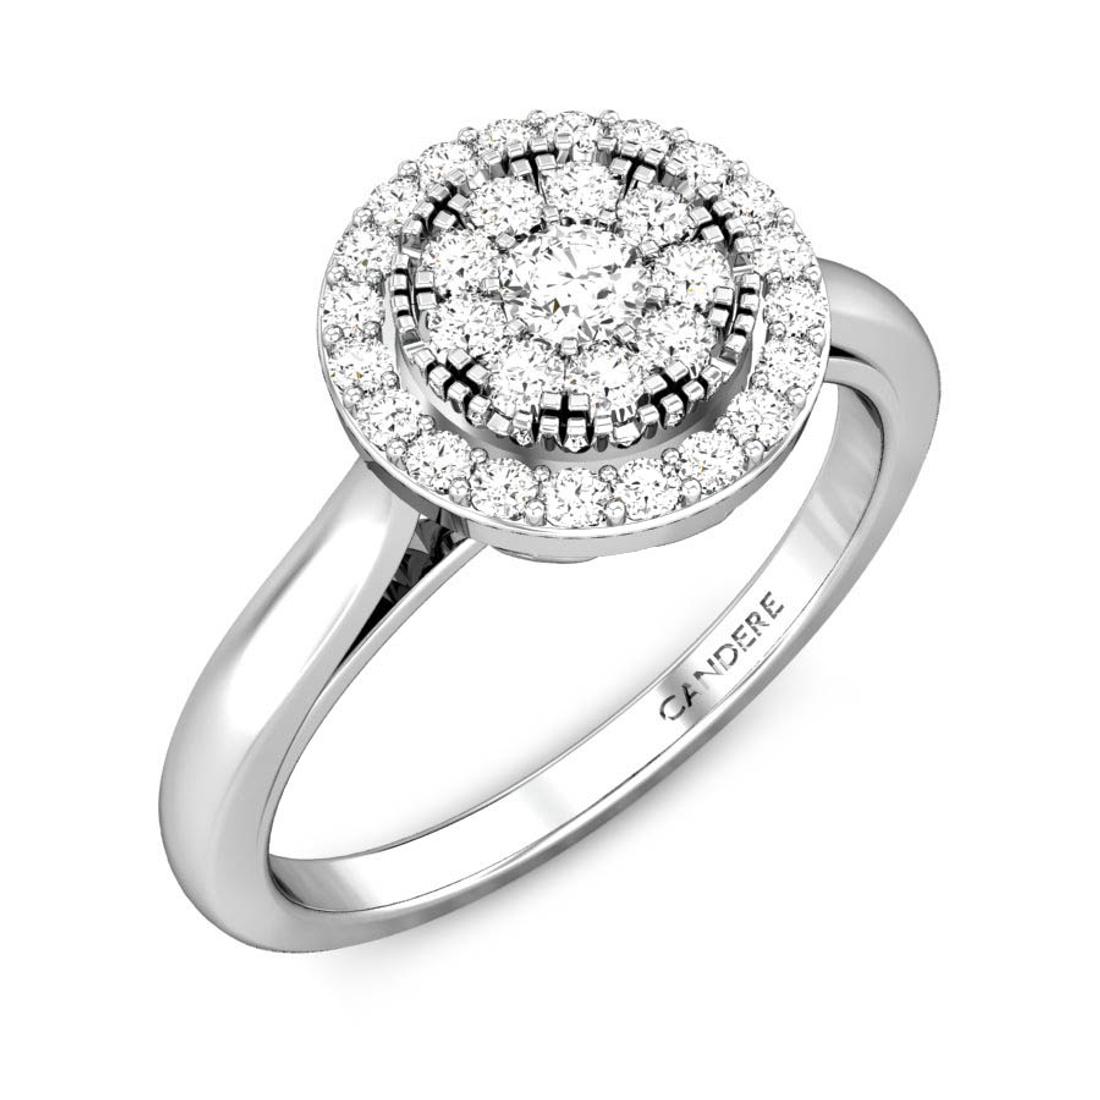 Candere By Kalyan Jewellers 14k (585) BIS Hallmark White Gold Orah Ziah Diamond Ring (IGI Certified)